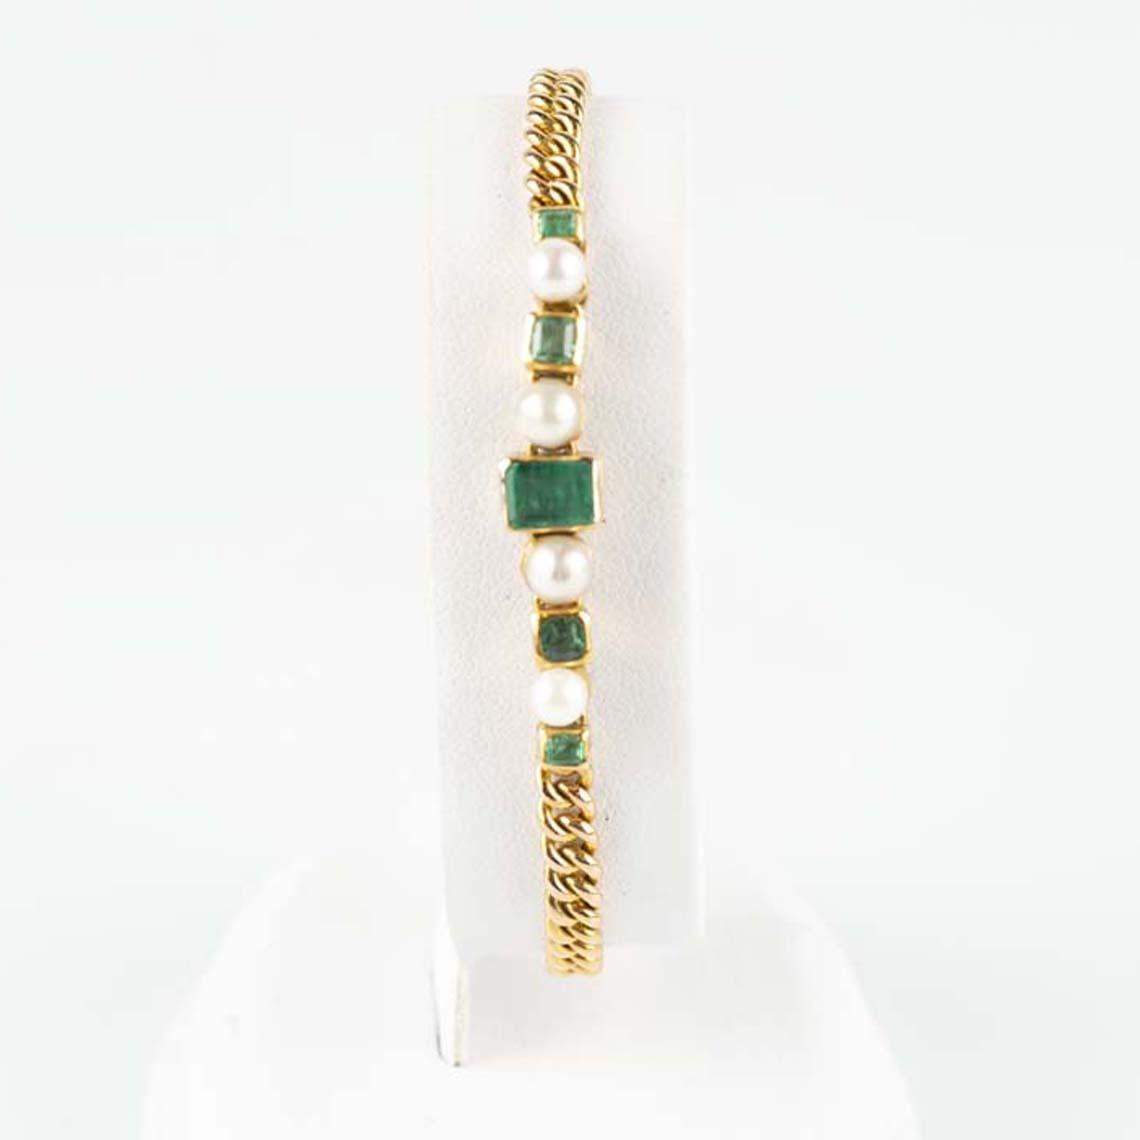 Vintage pearl and emerald bracelet